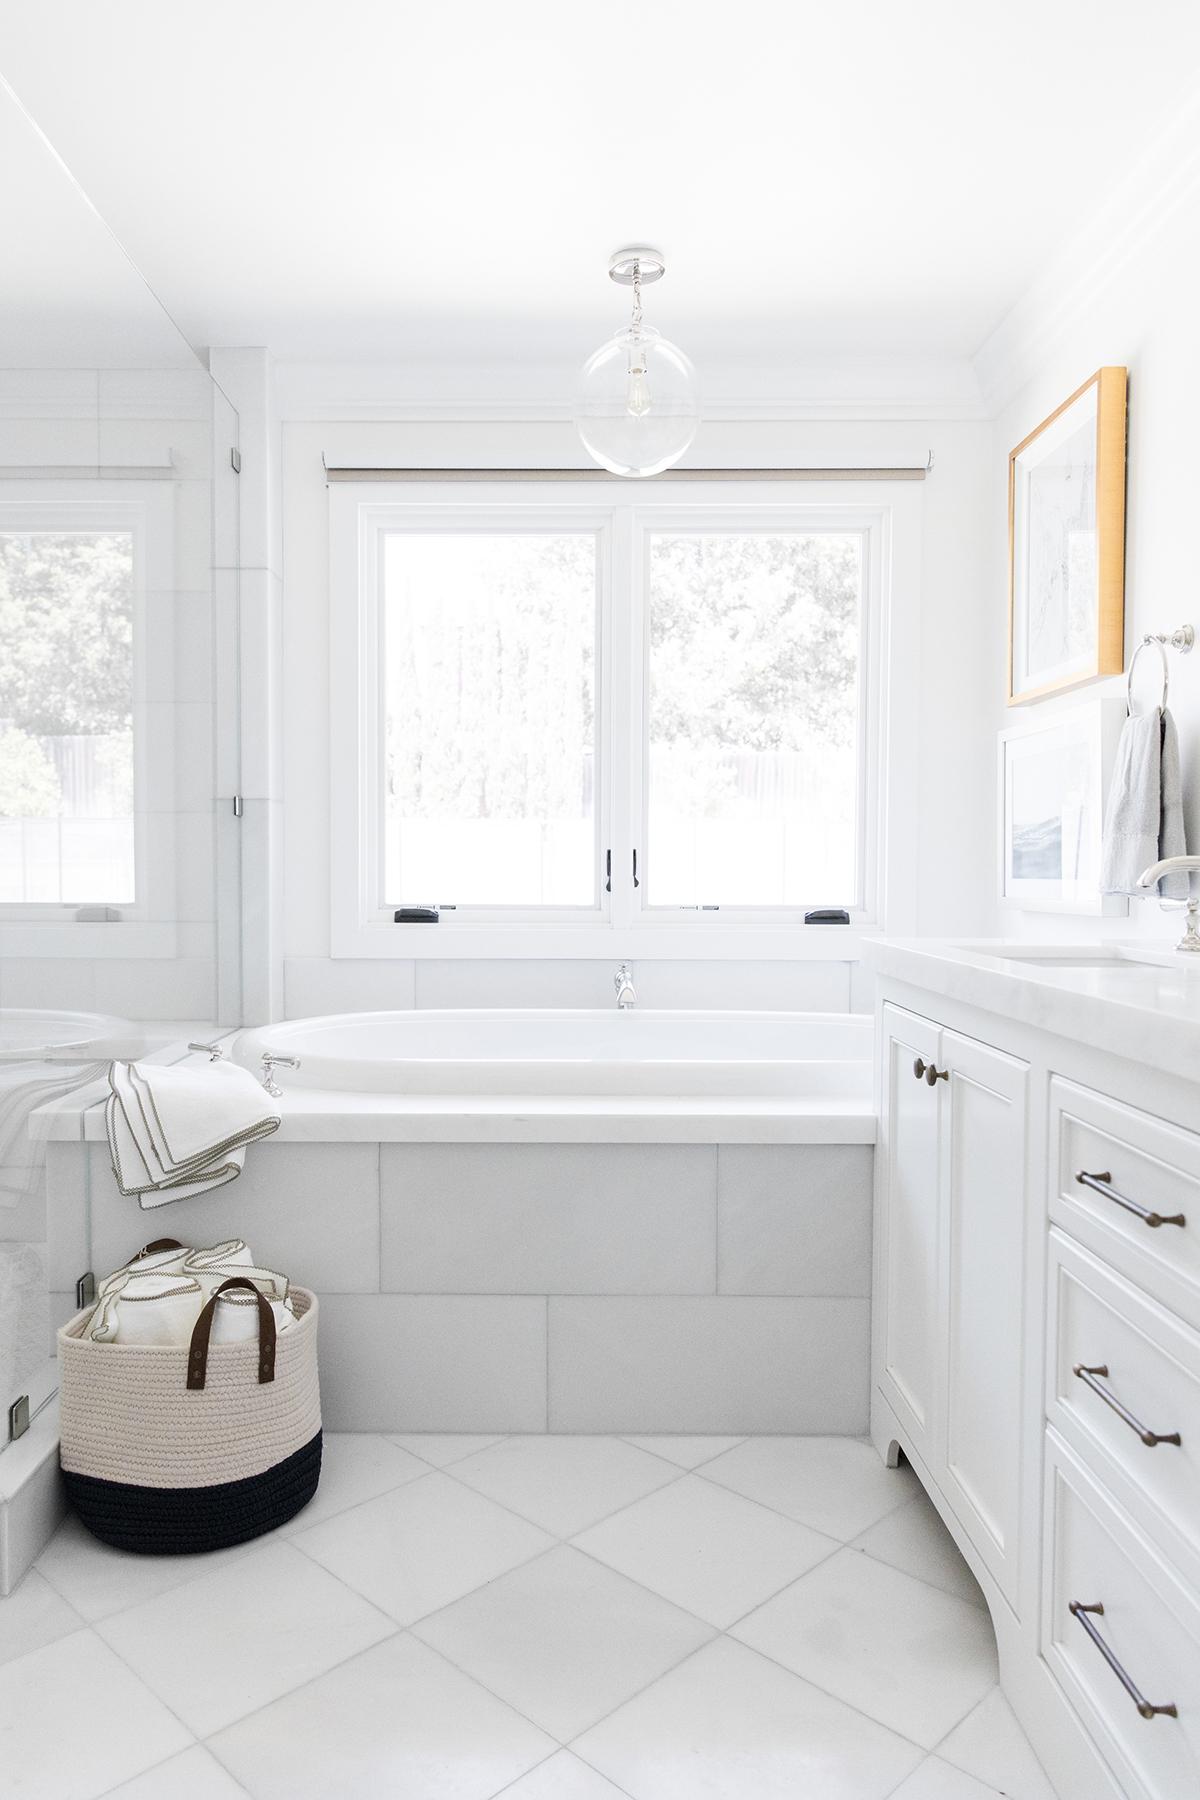 Clean+and+coastal+bathroom+with+pendant+over+bathtub,+brass+and+polished+nickel+decor+in+bathroom+_+Studio+McGee+Design-1.jpg